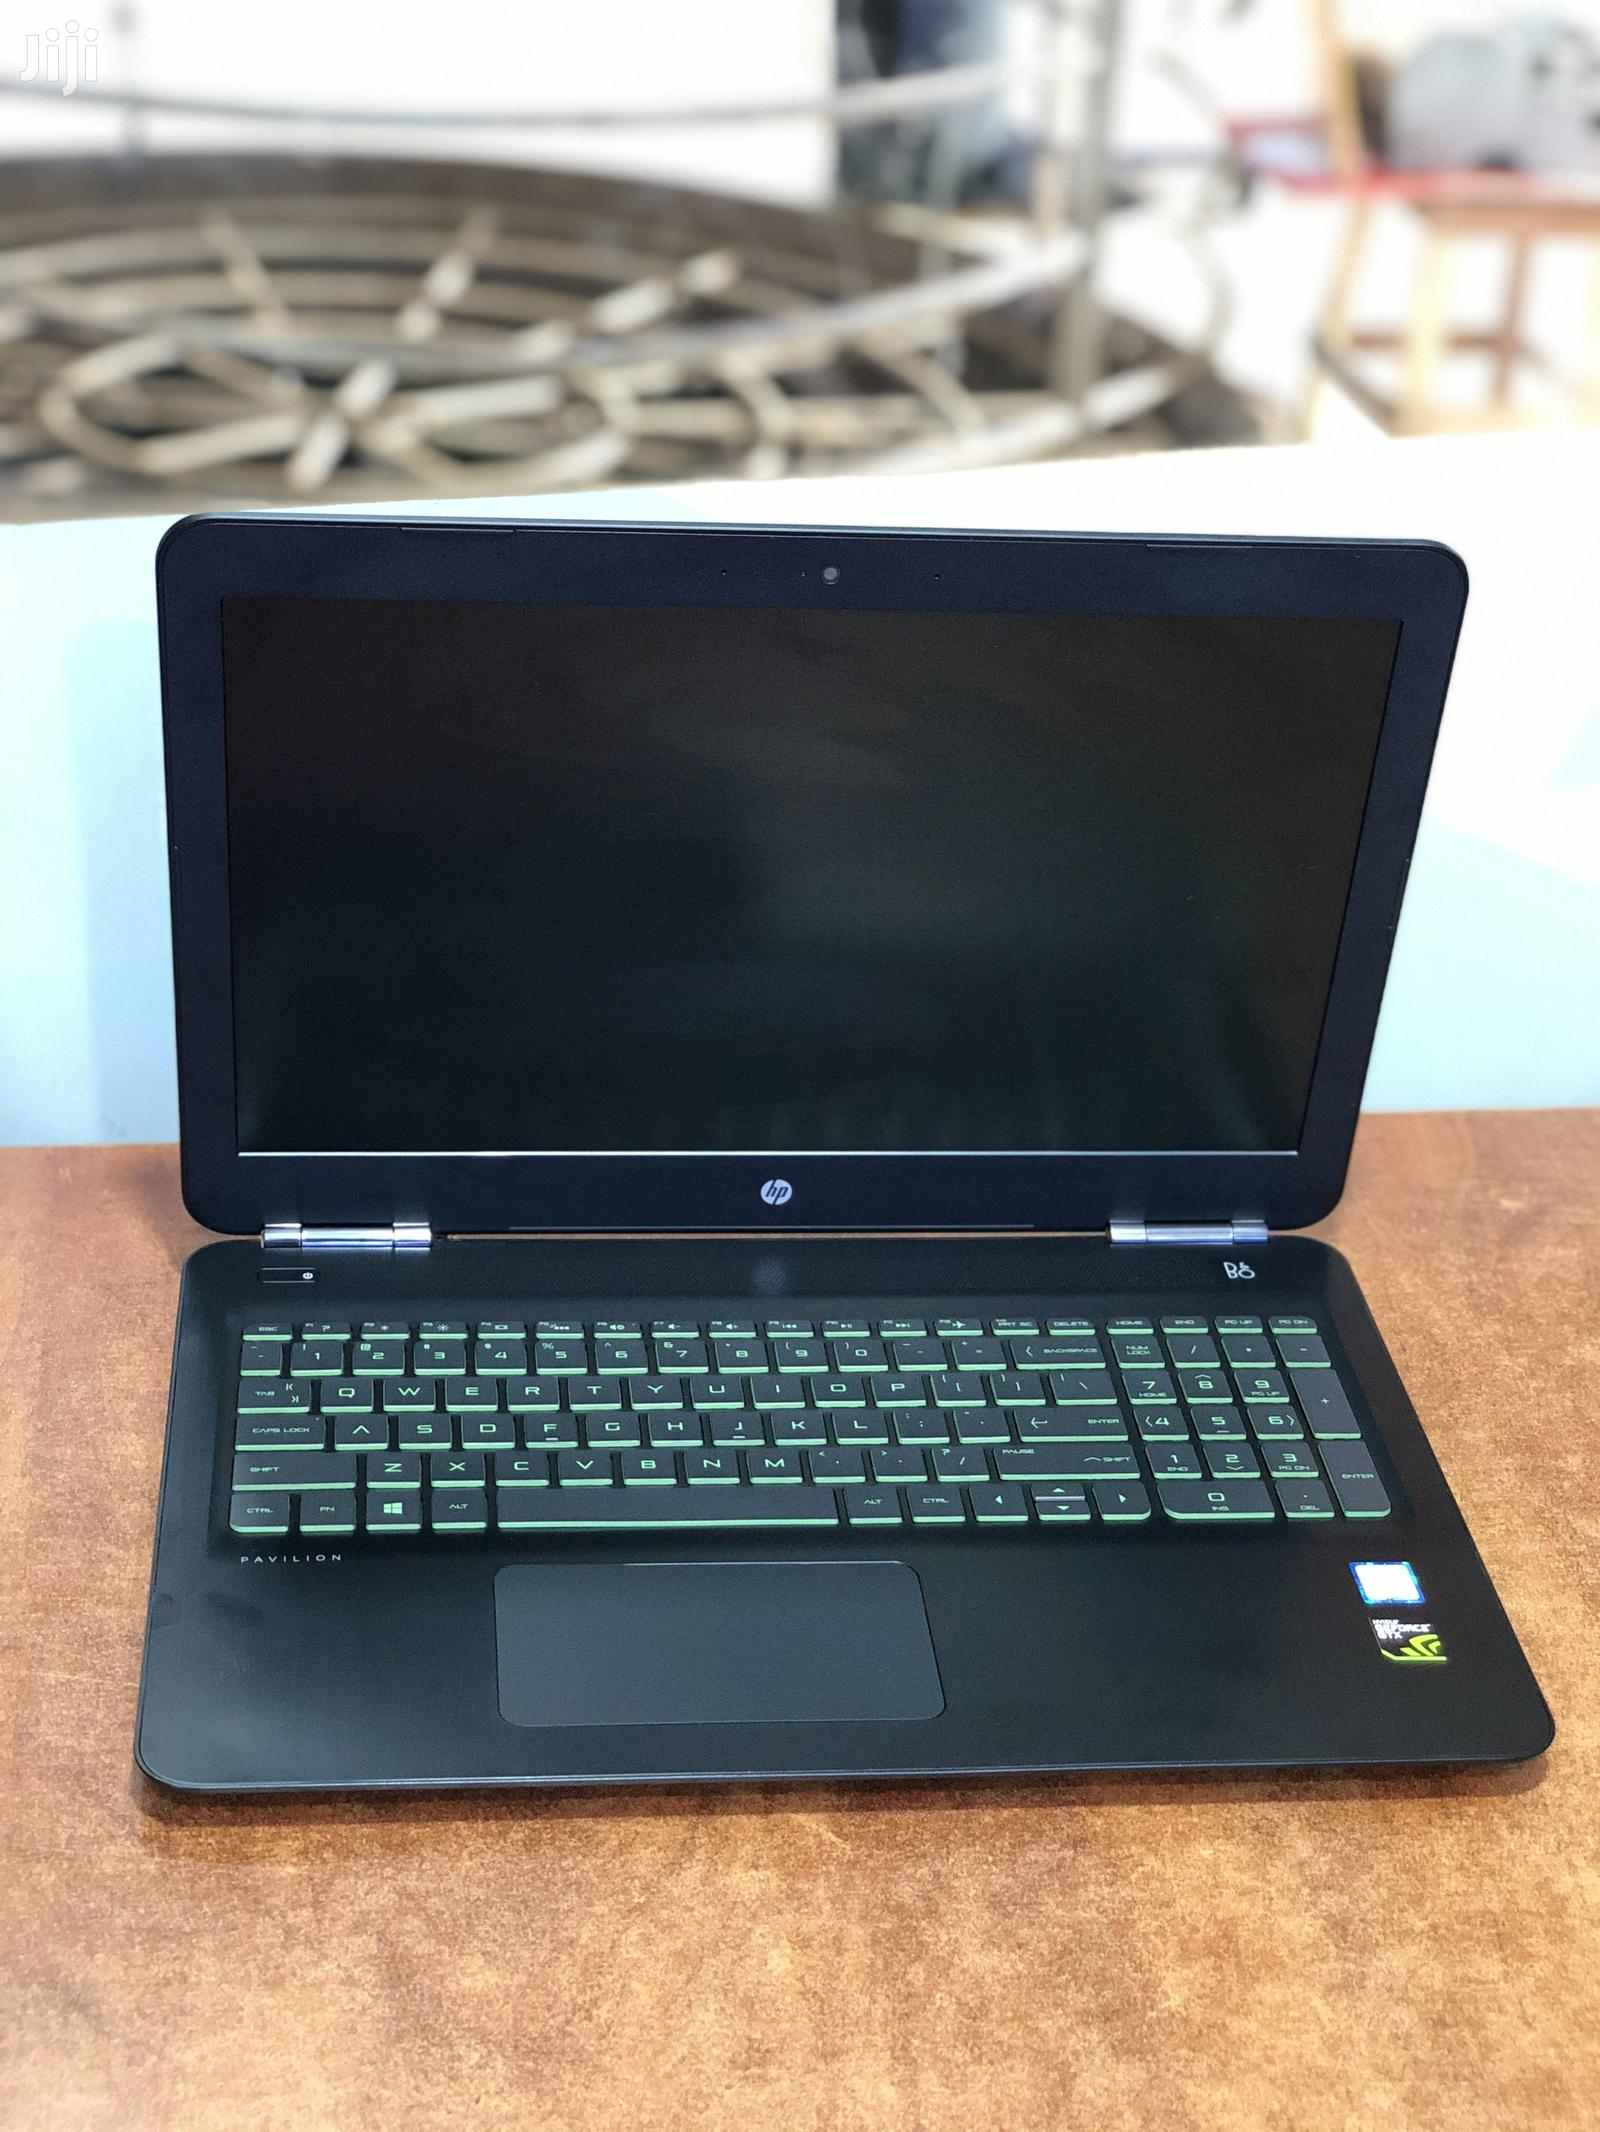 New Laptop HP Pavilion 15 8GB Intel Core i5 SSHD (Hybrid) 1T